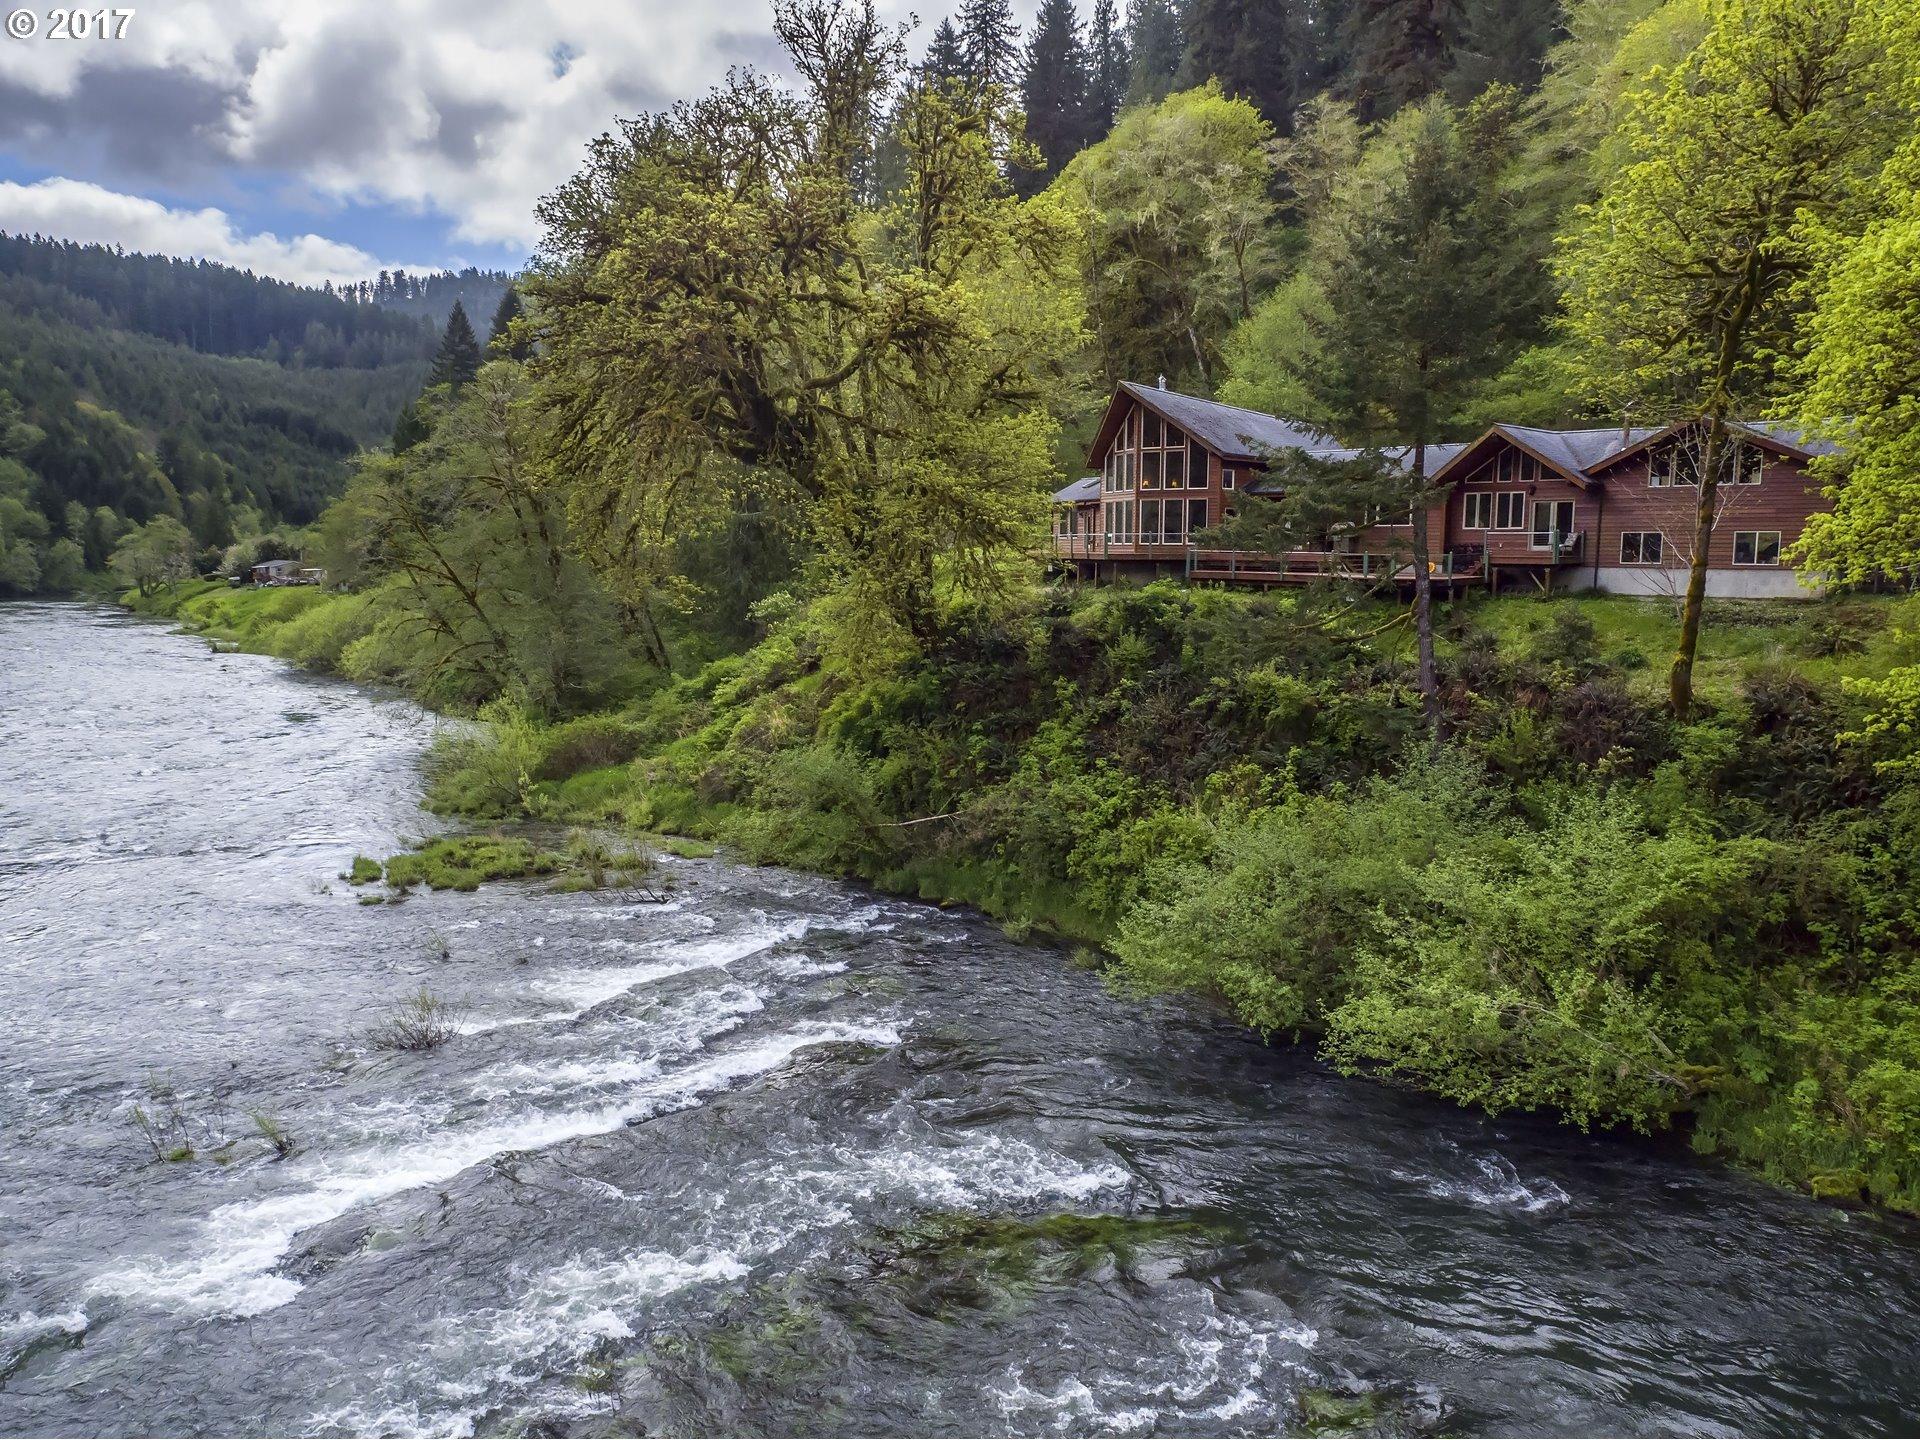 2376 LITTLE SWITZERLAND RD Tidewater, OR 97390 - MLS #: 17273424